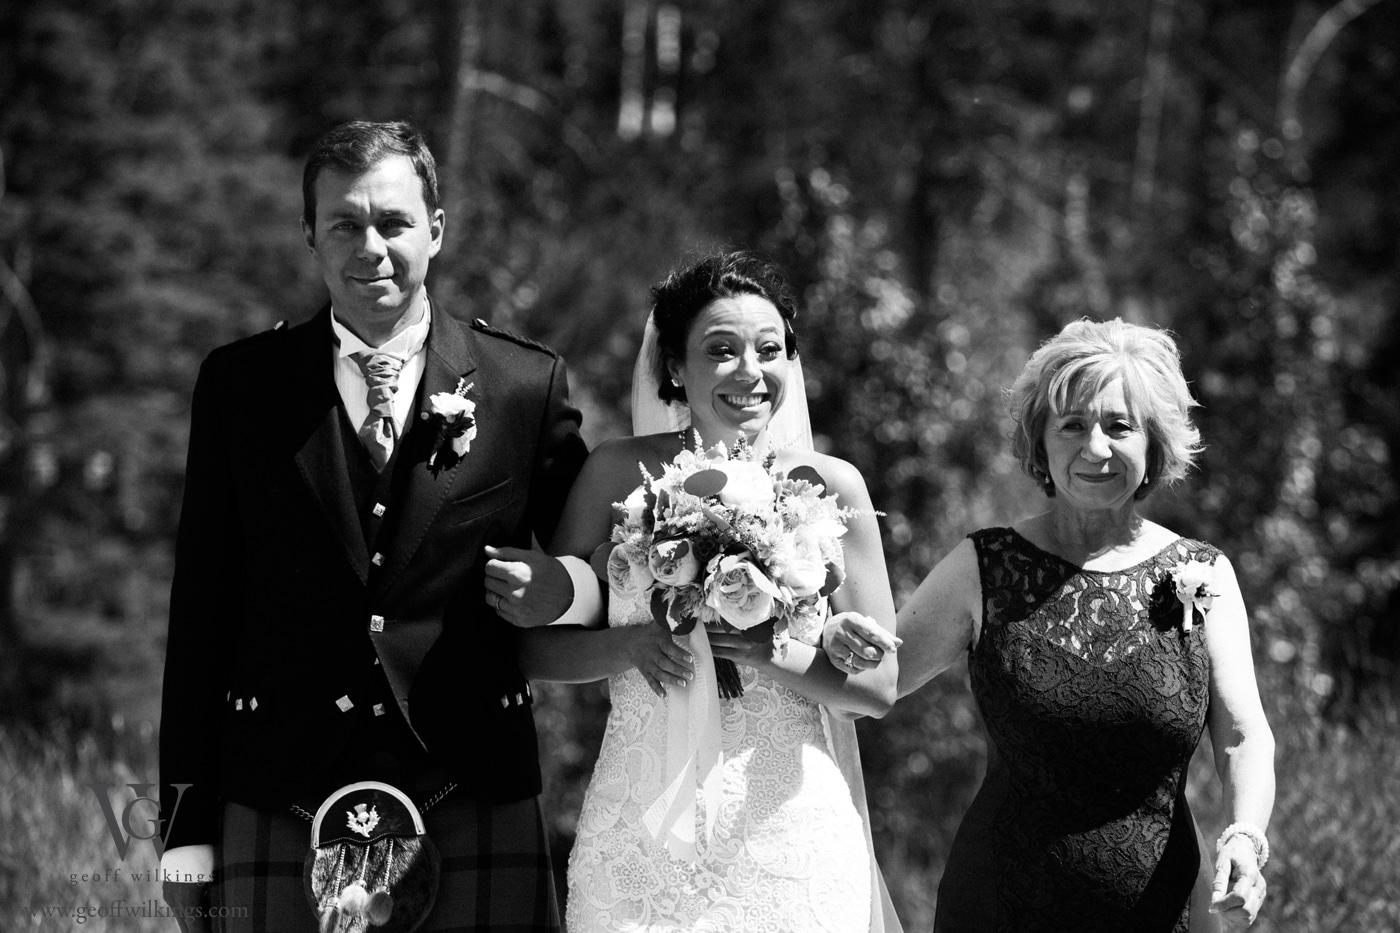 Silvertip wedding photos Calgary wedding photographers Geoff Wilkings Photography_010